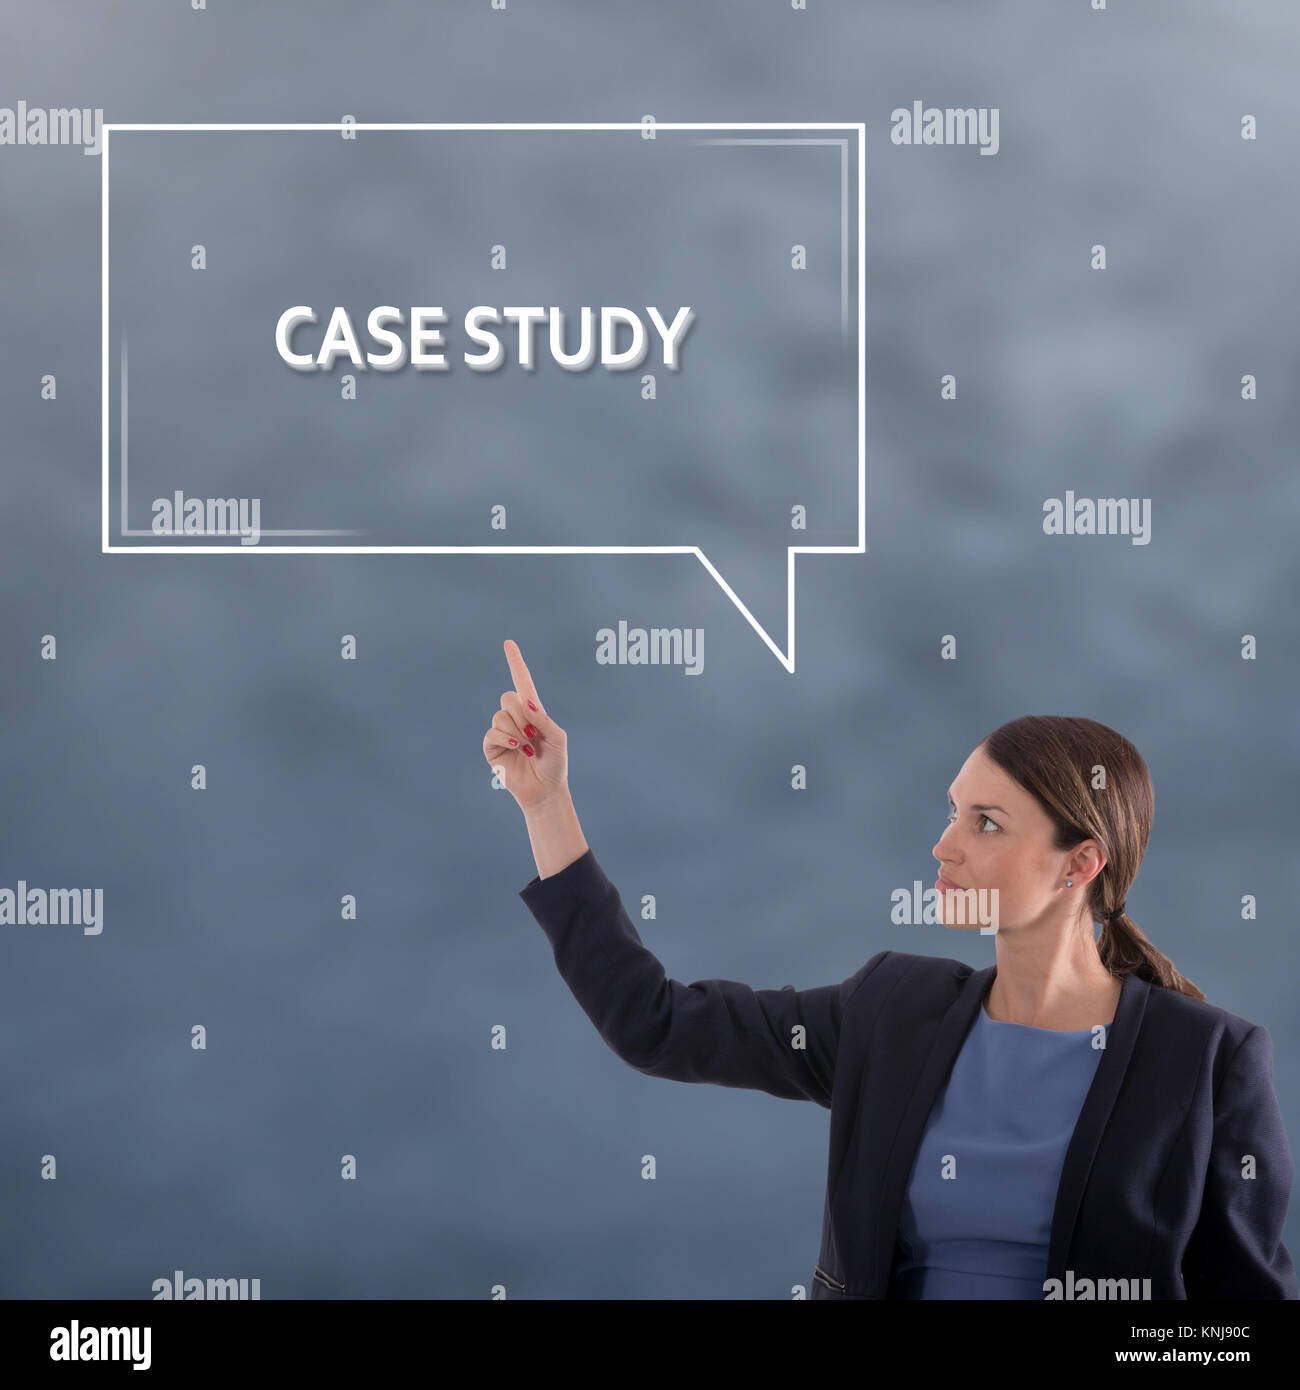 career planning case study